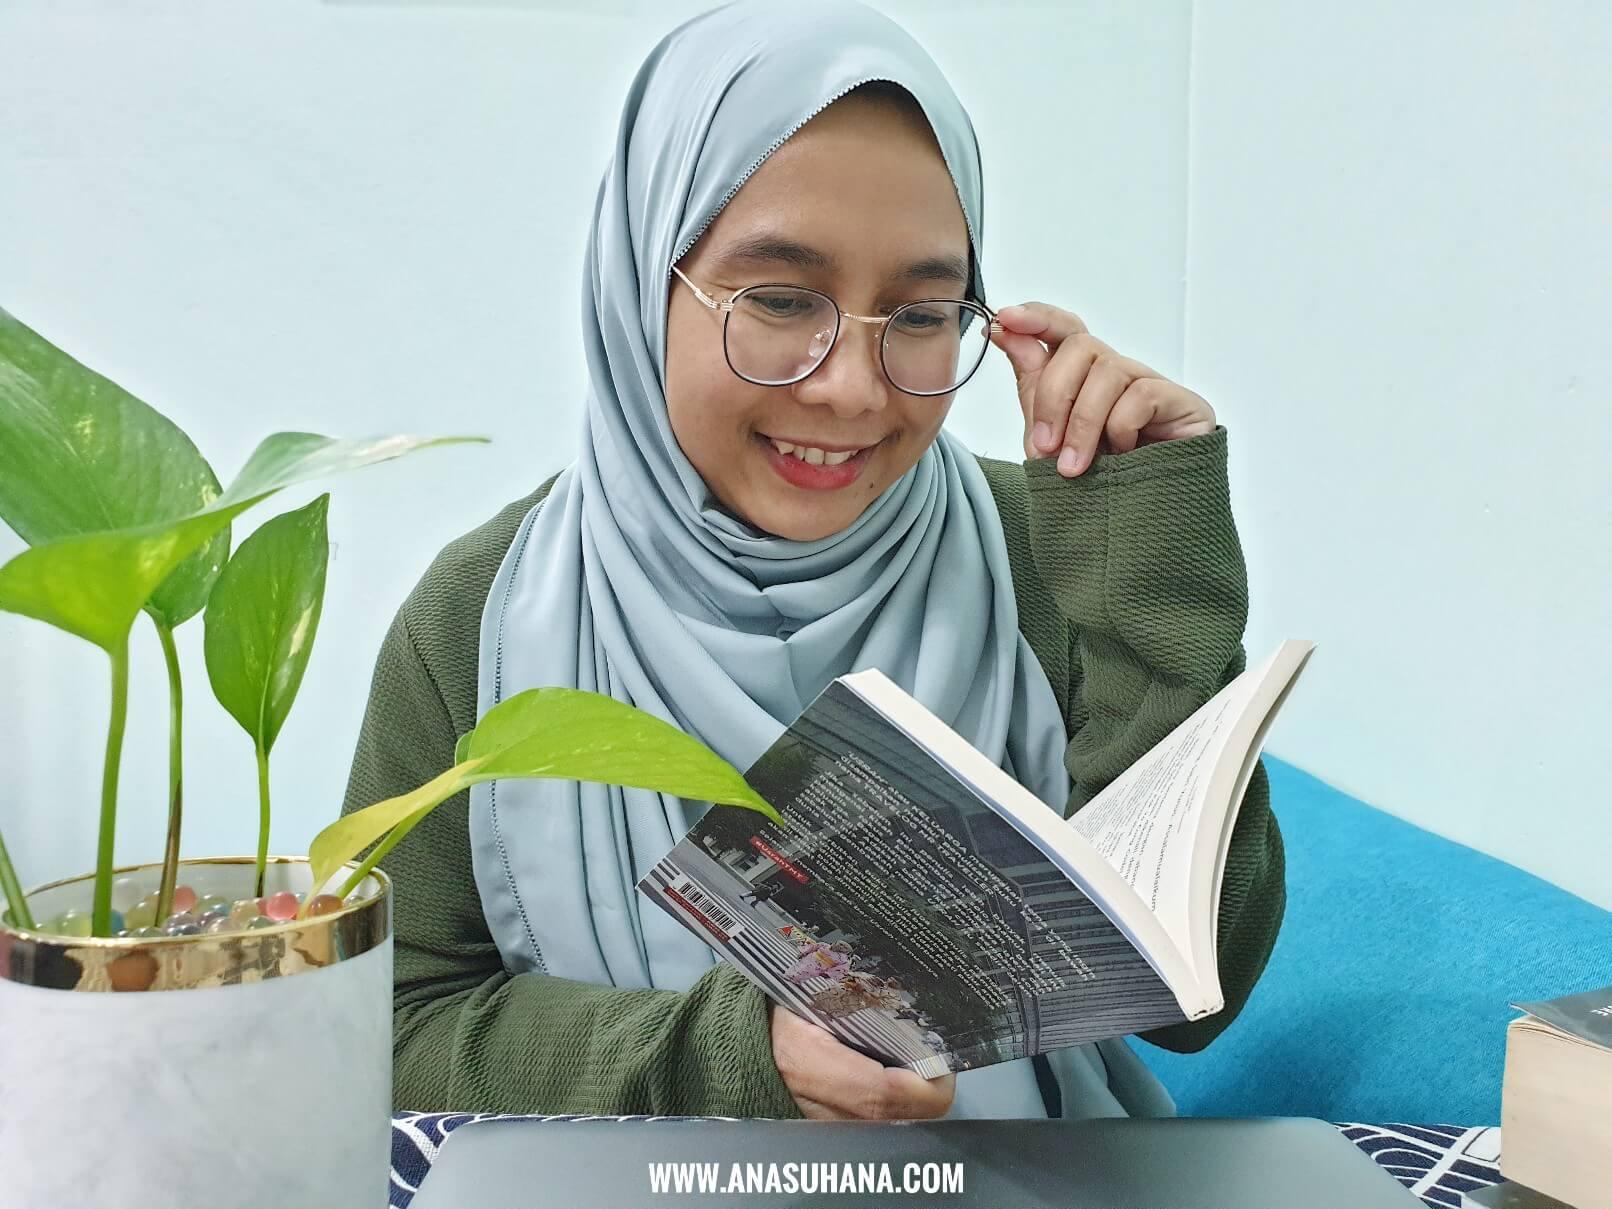 Cermin Mata Murah Dengan Alpha Blue 420 Lens di Eye Pro Vision. Patutlah Jadi Kedai Spek Viral di Malaysia !!